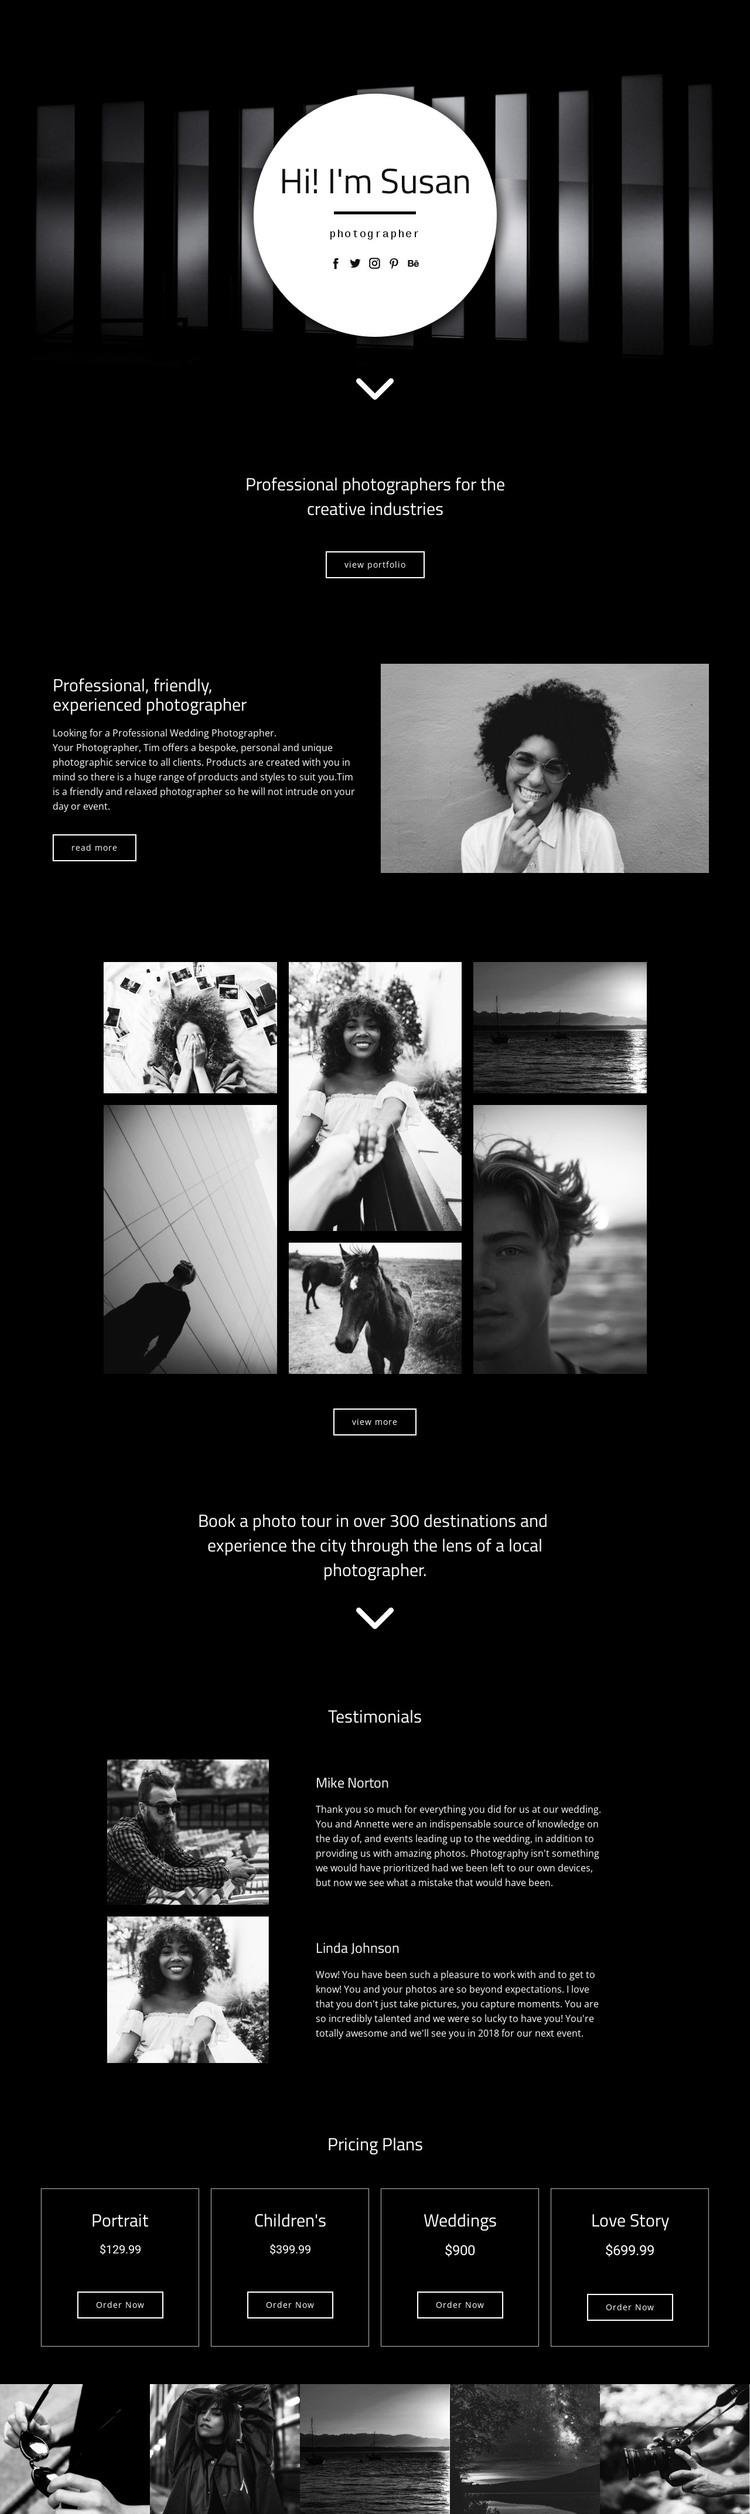 Your Photographer Web Design